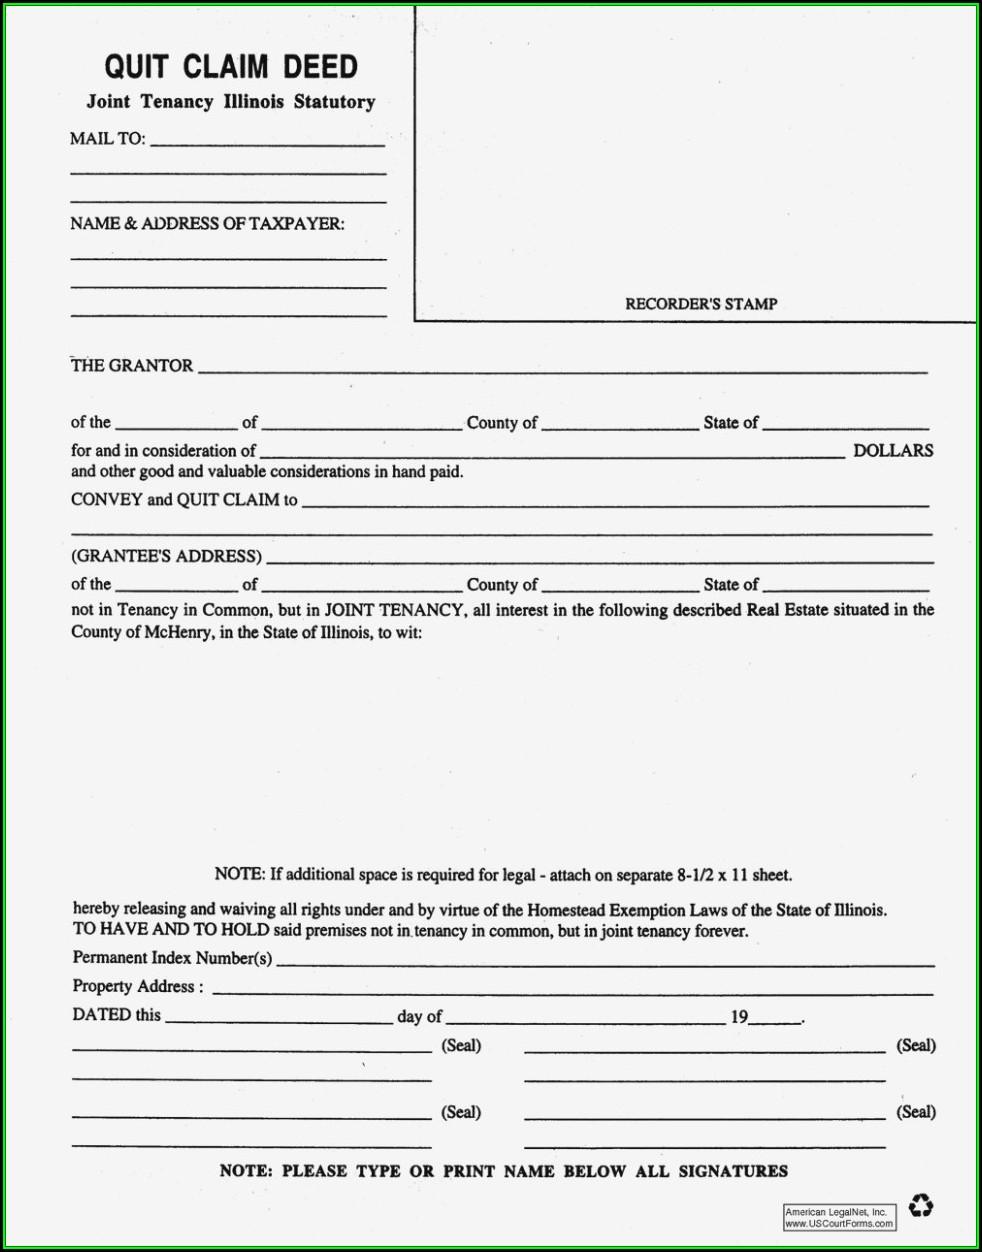 Blank Quit Claim Deed Form Nevada